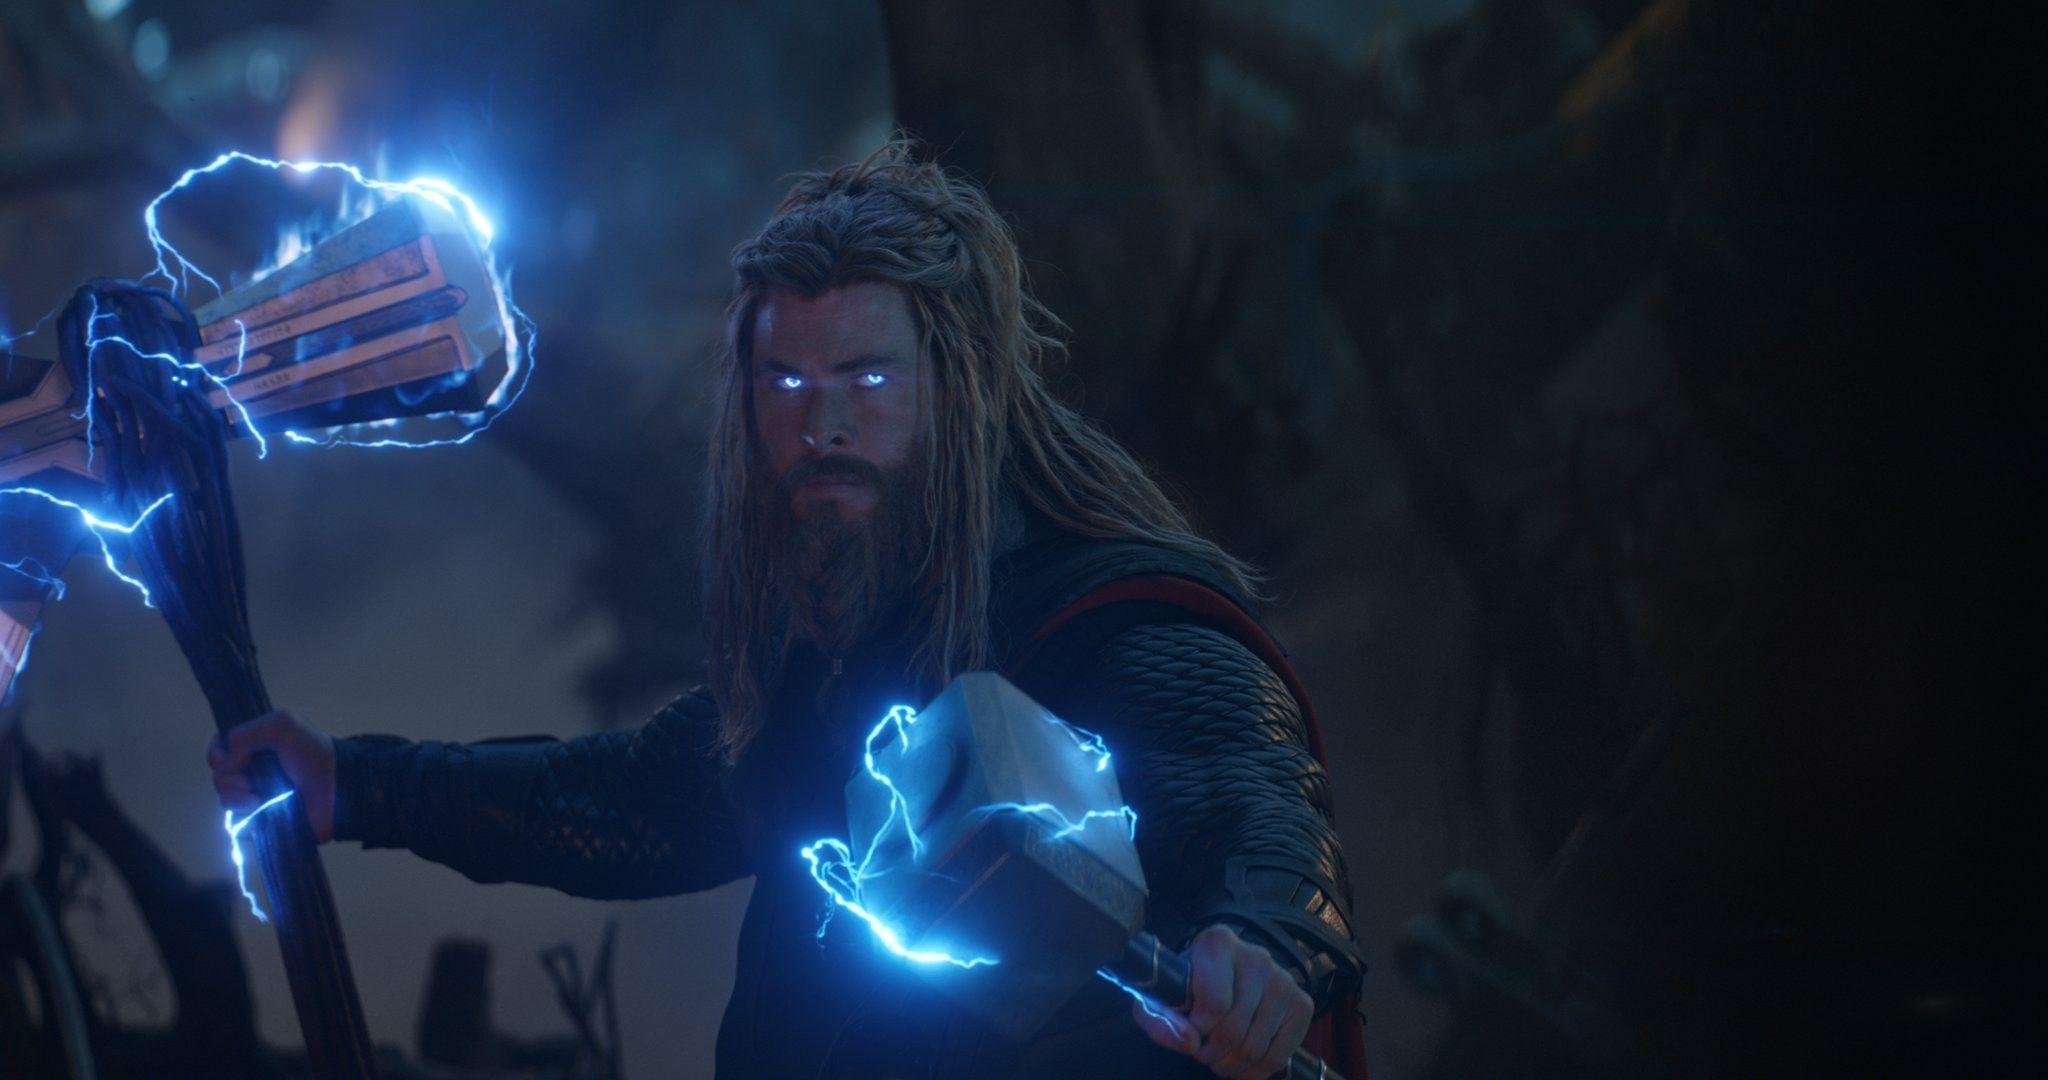 Thor with Stormbreaker and Moljneir   Avengers, Marvel, Marvel avengers funny